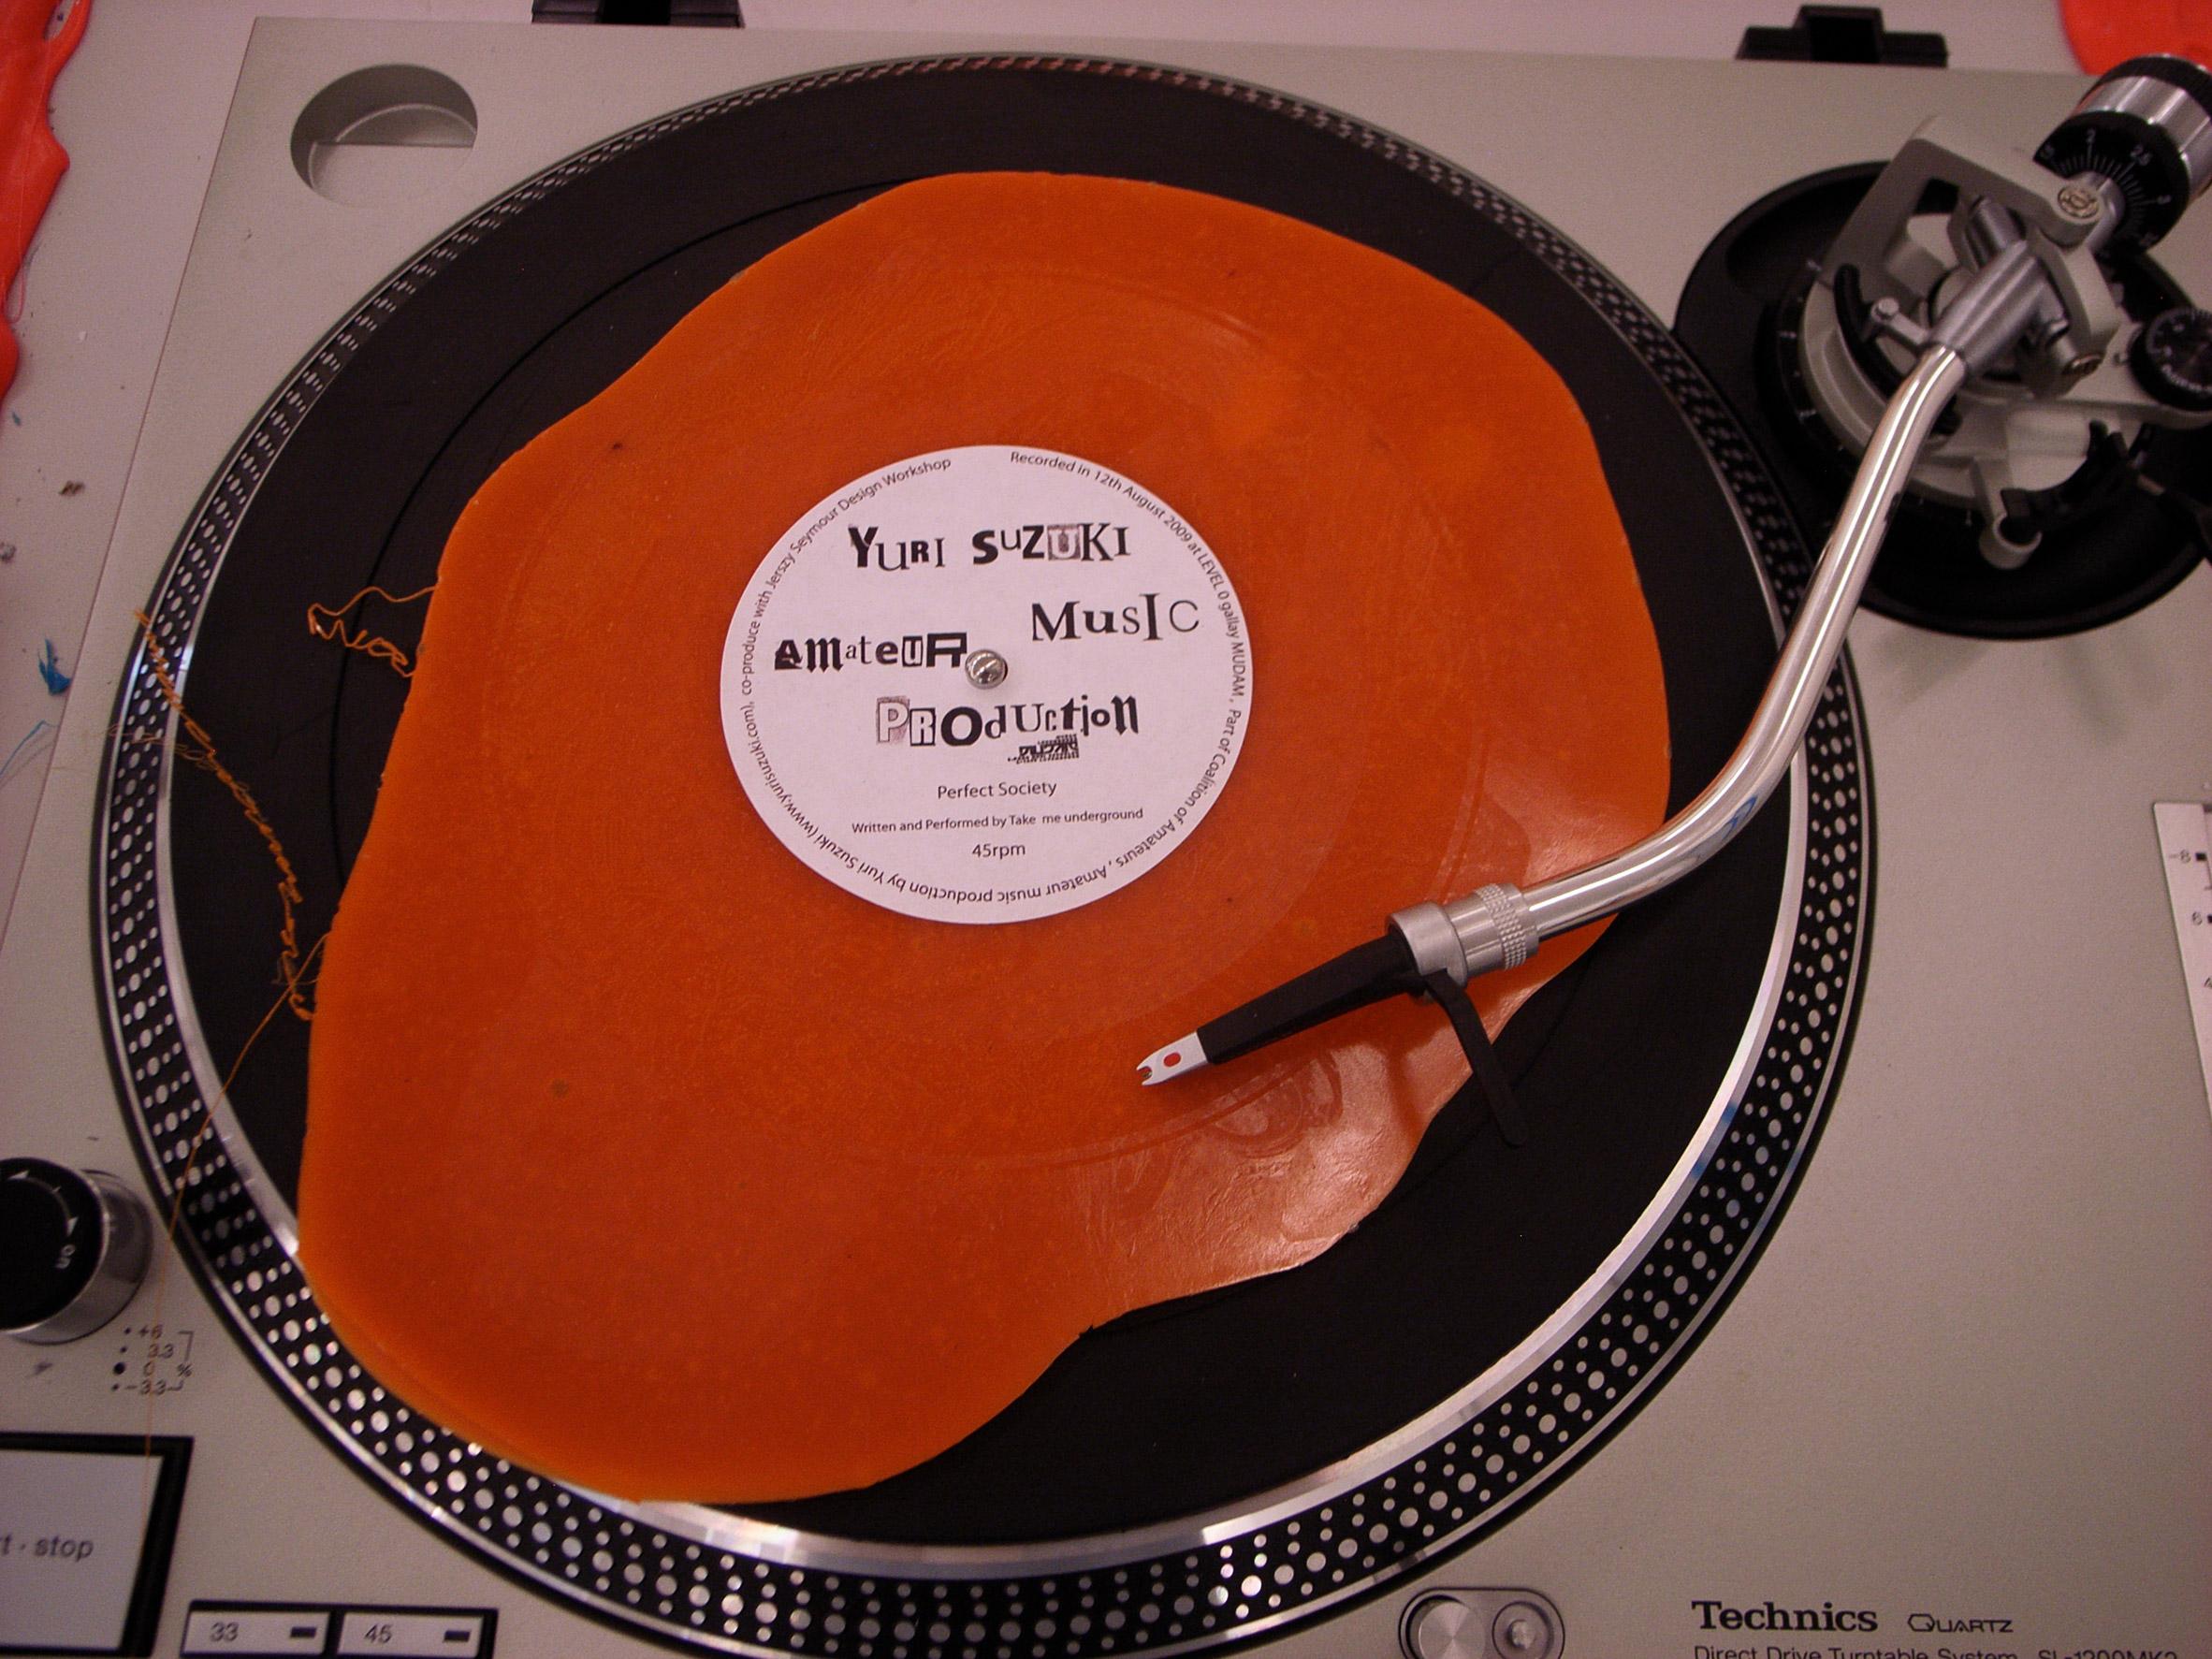 Yuri Sukuki sound design: Amateur Music Production